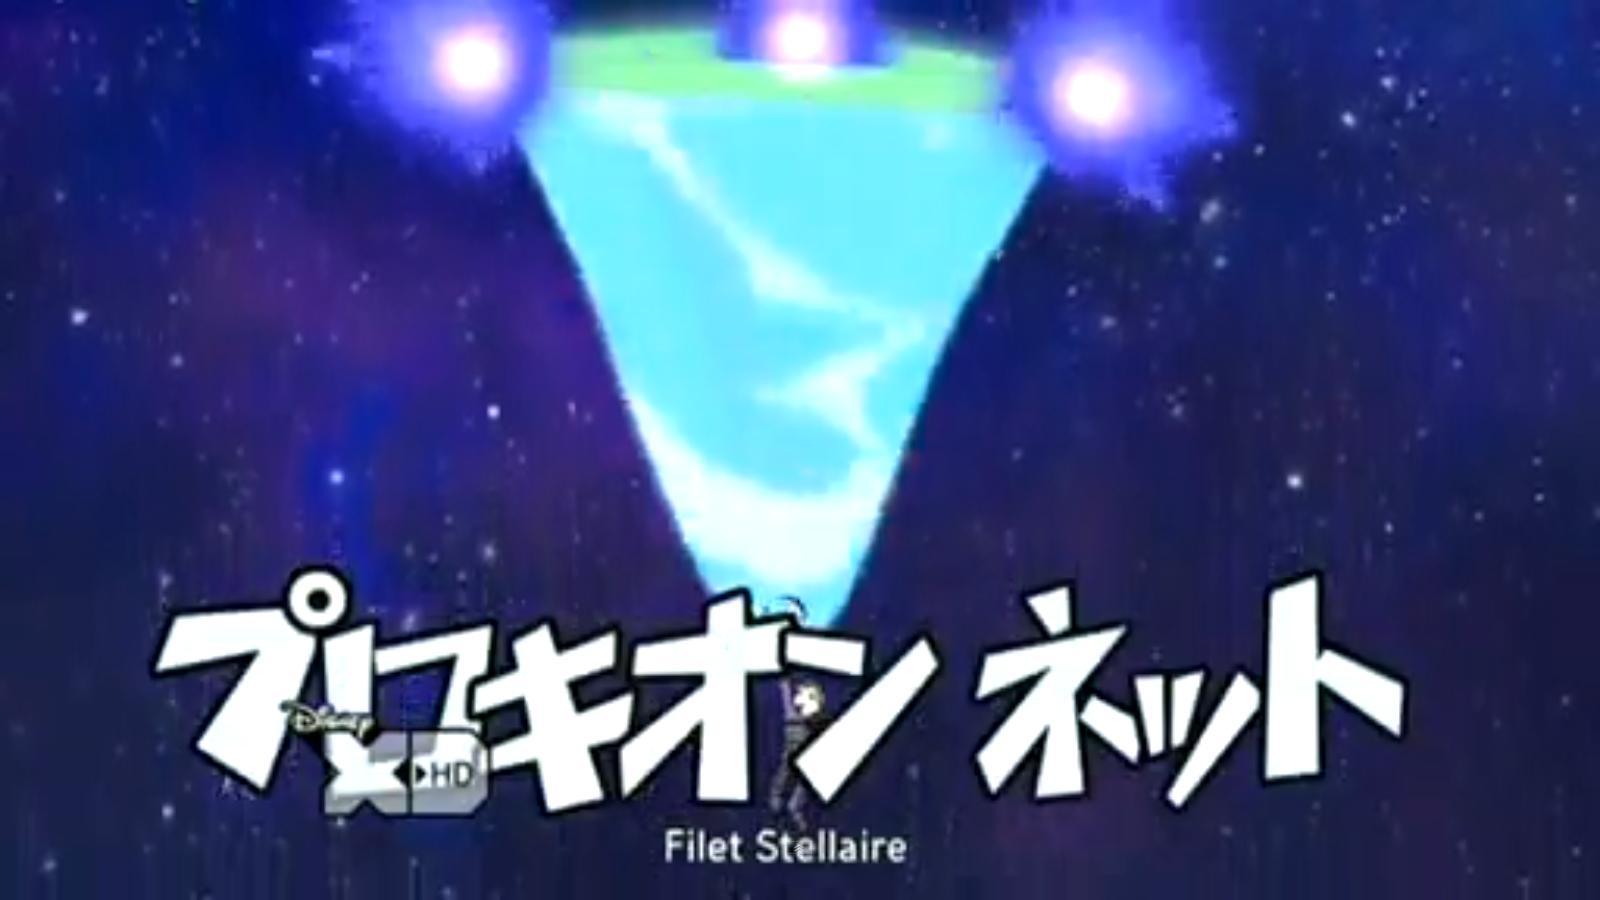 Filet Stellaire